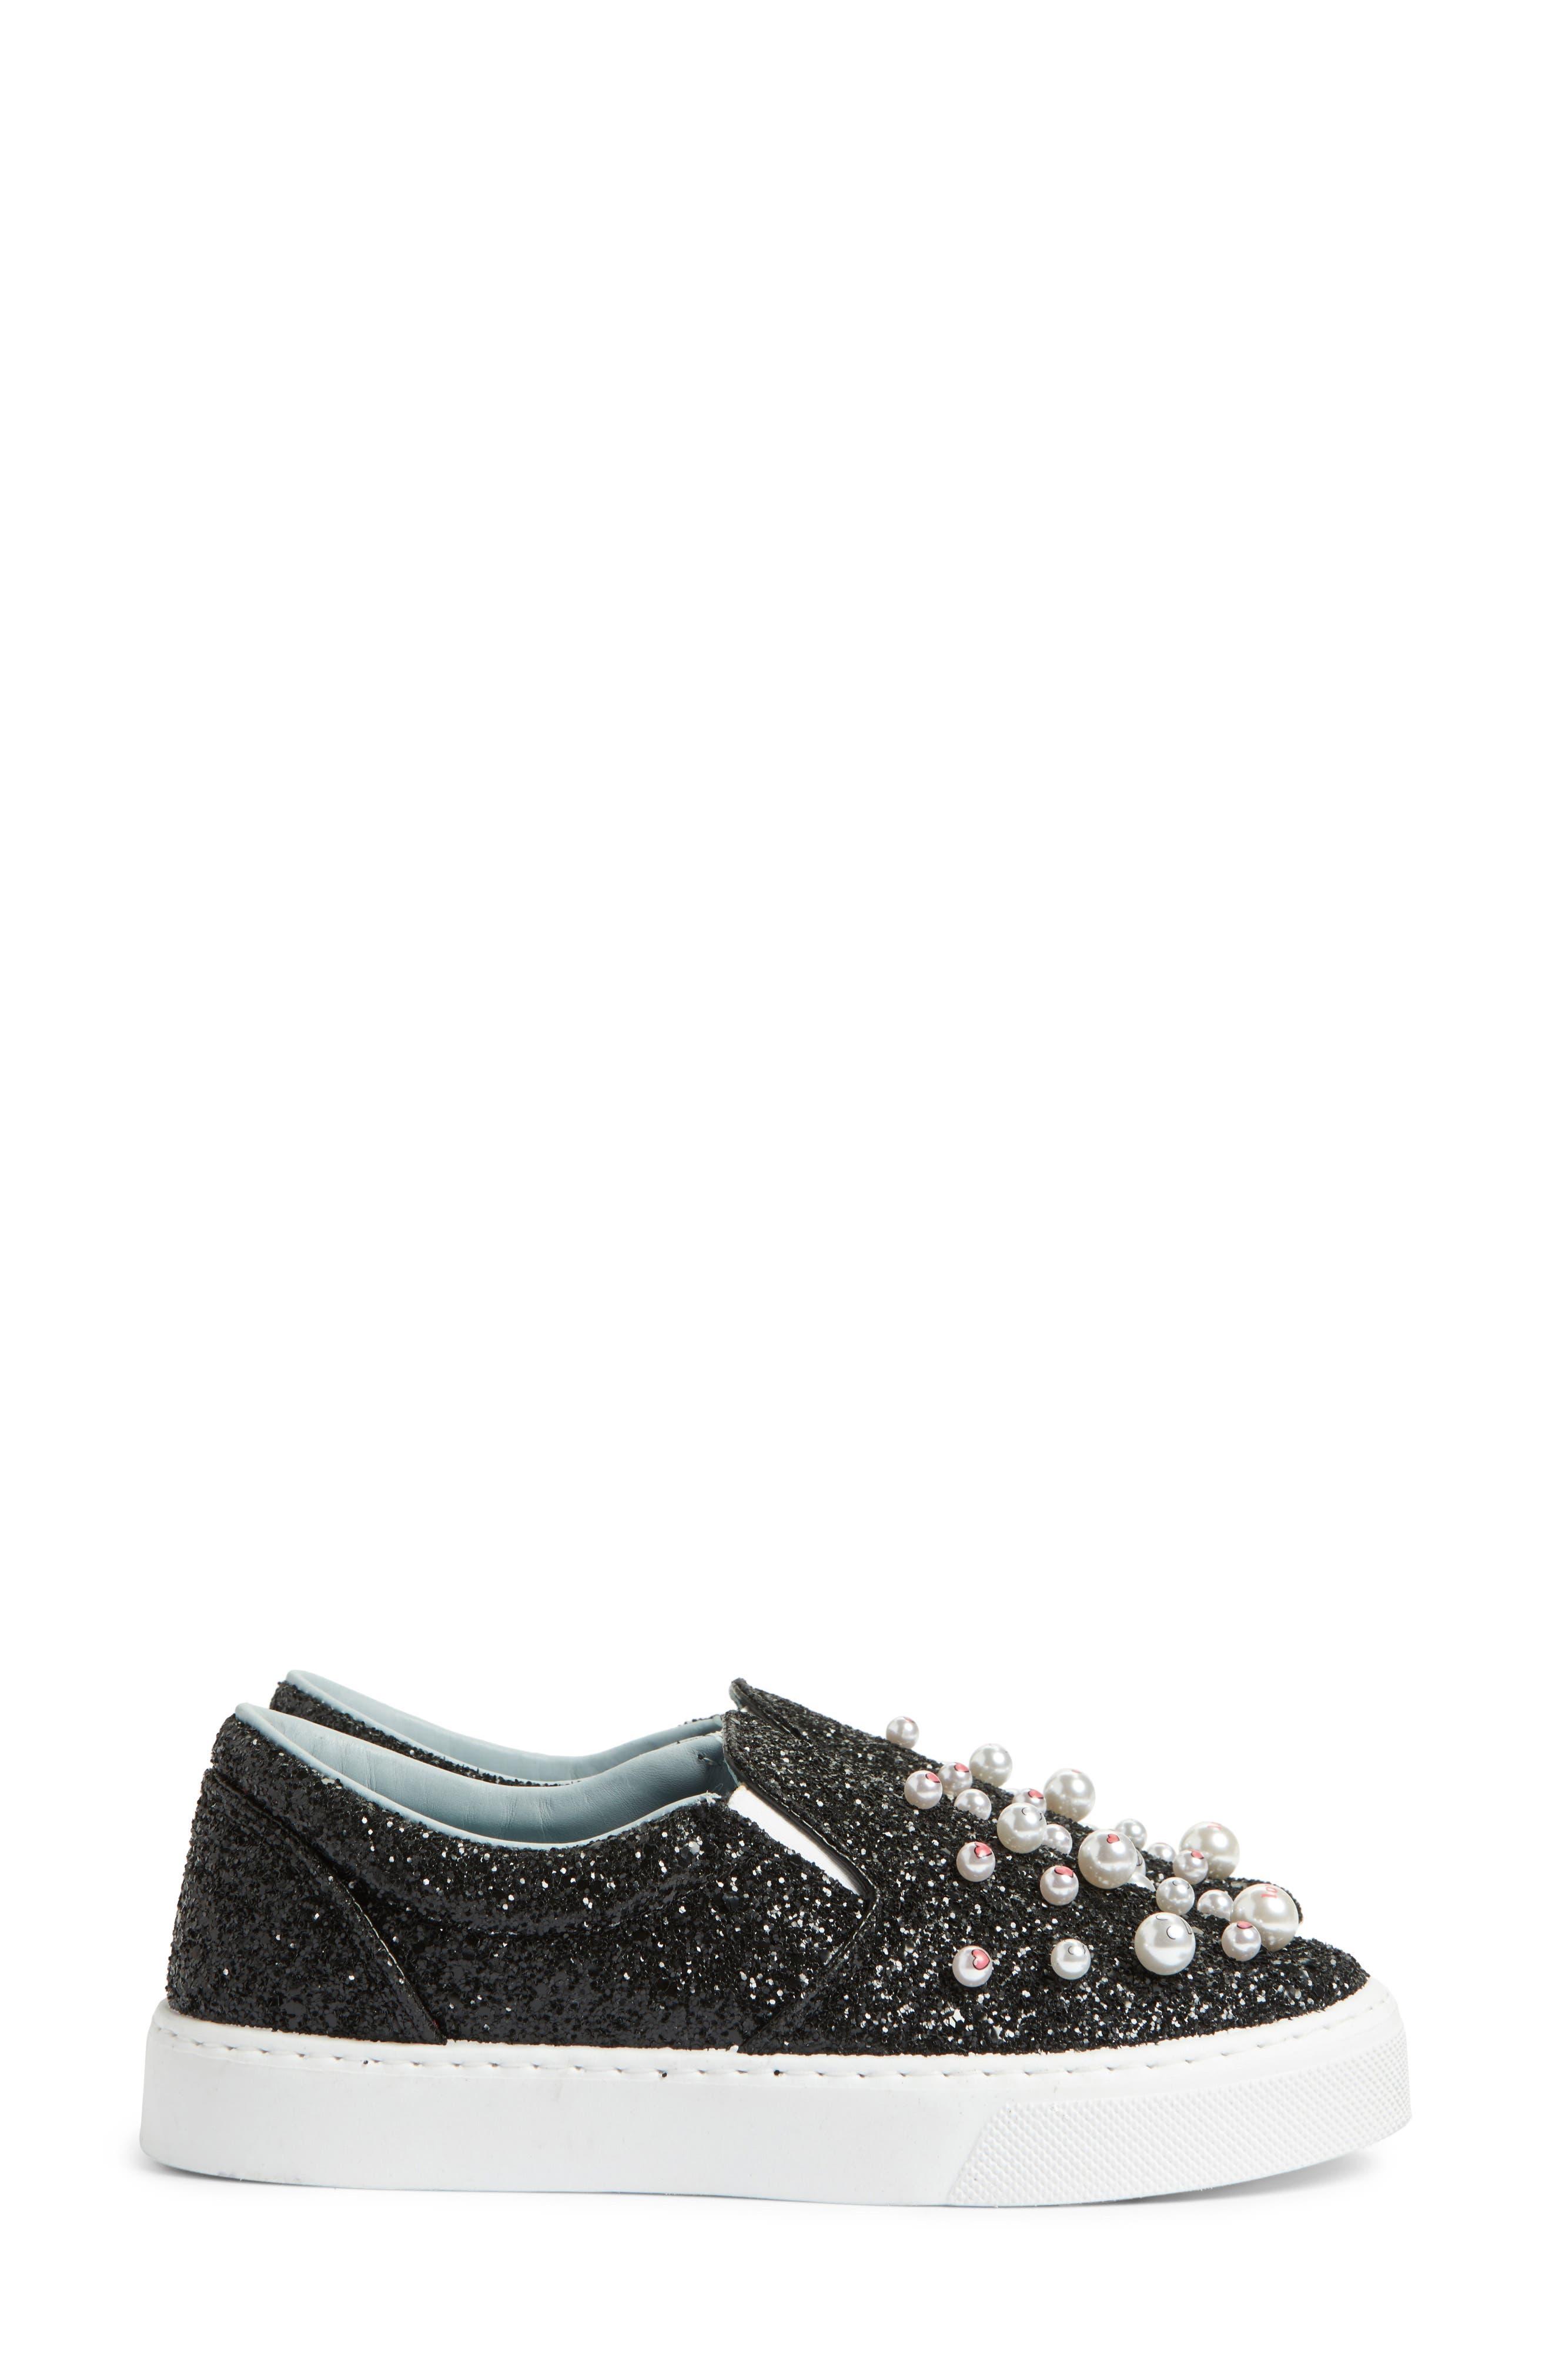 Candies Embellished Slip-On Sneaker,                             Alternate thumbnail 3, color,                             001